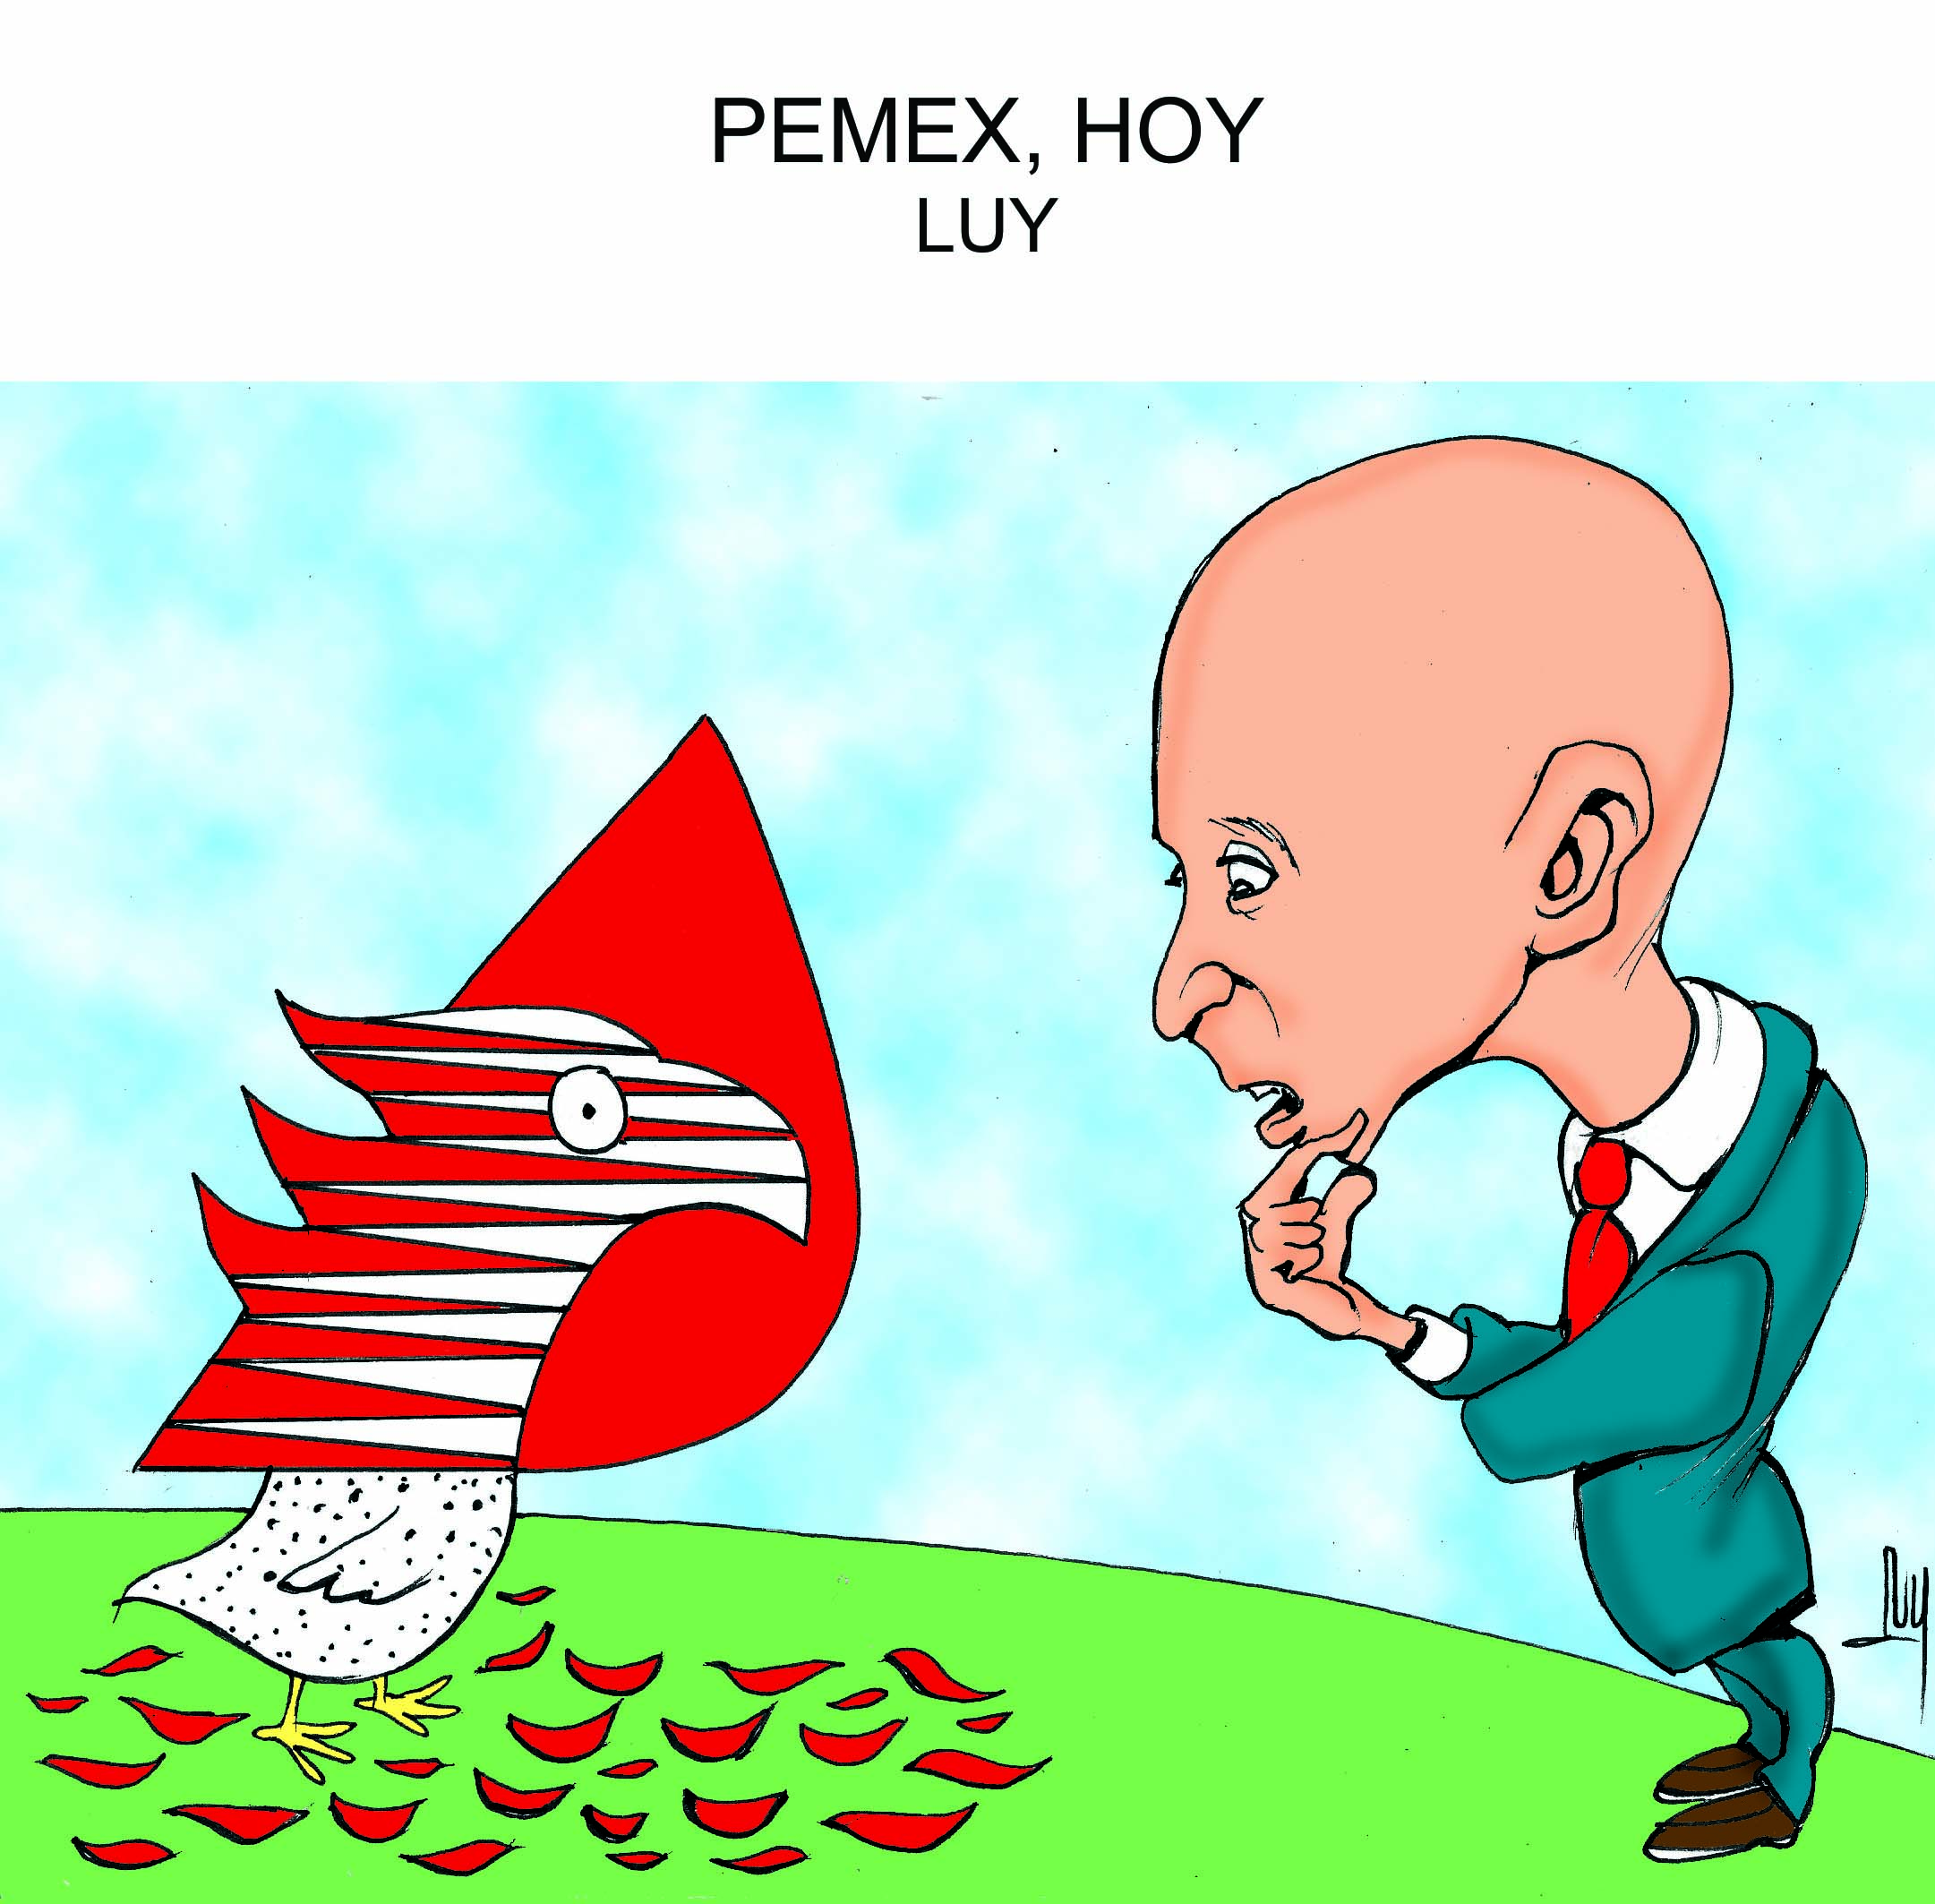 pemex-hoy